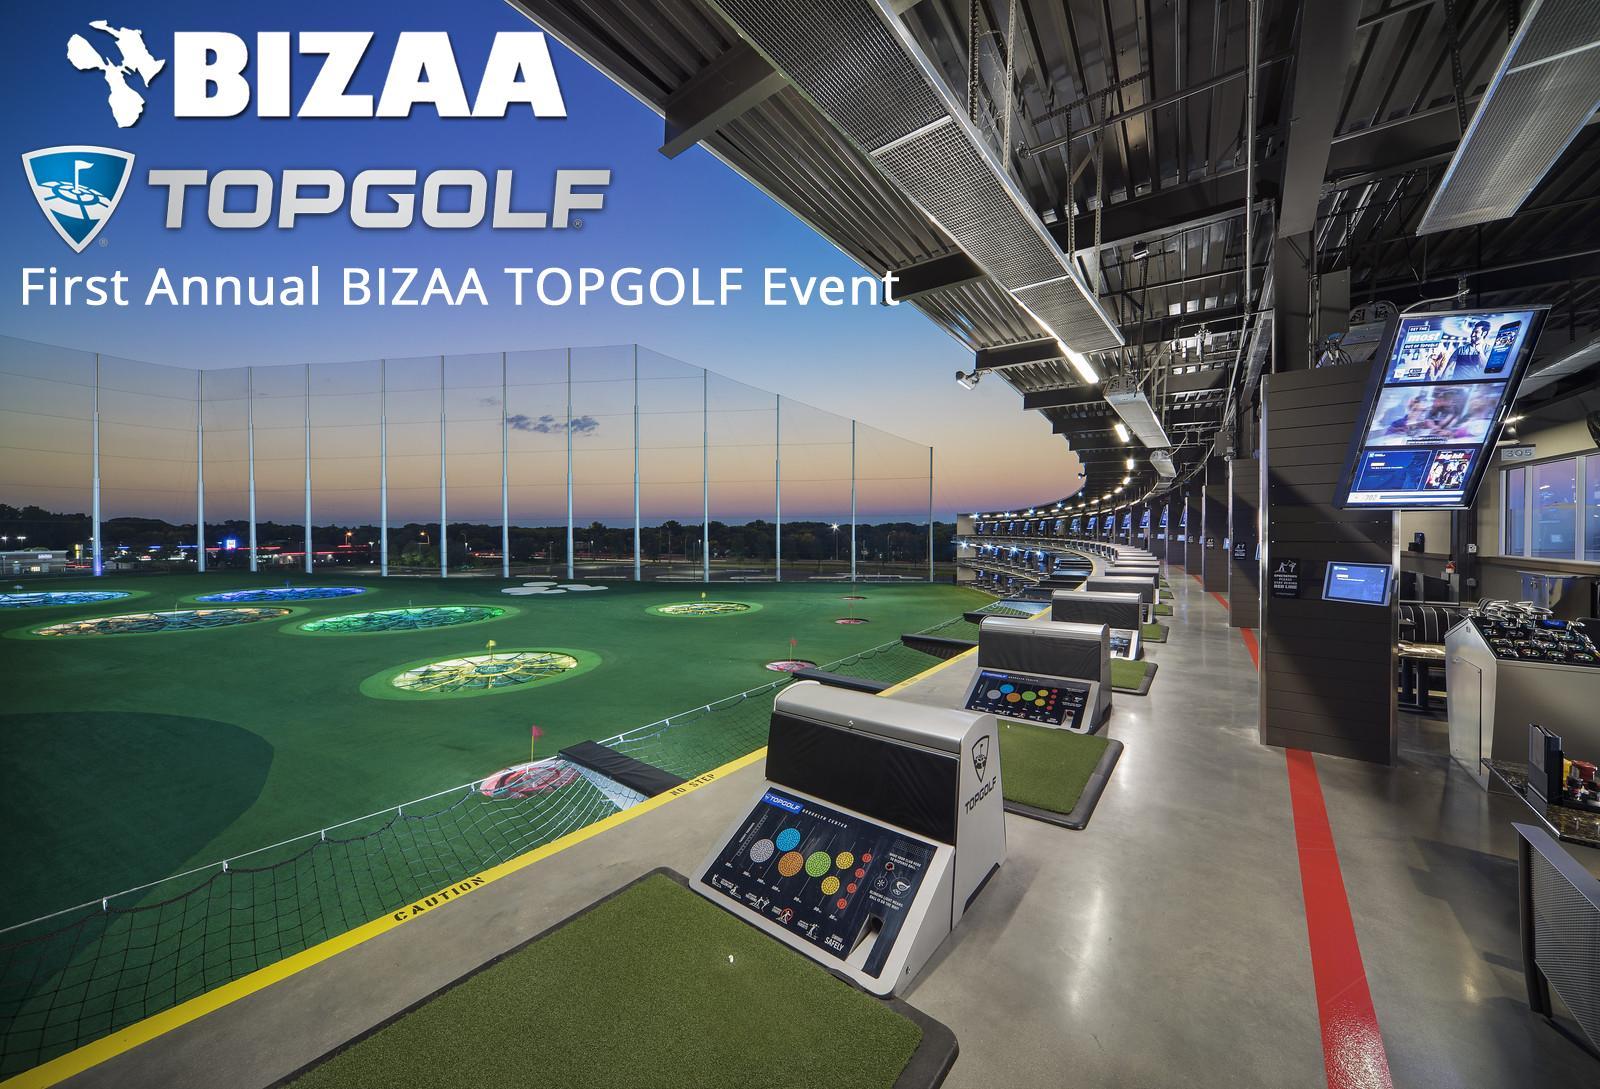 First Annual BIZAA Topgolf Event